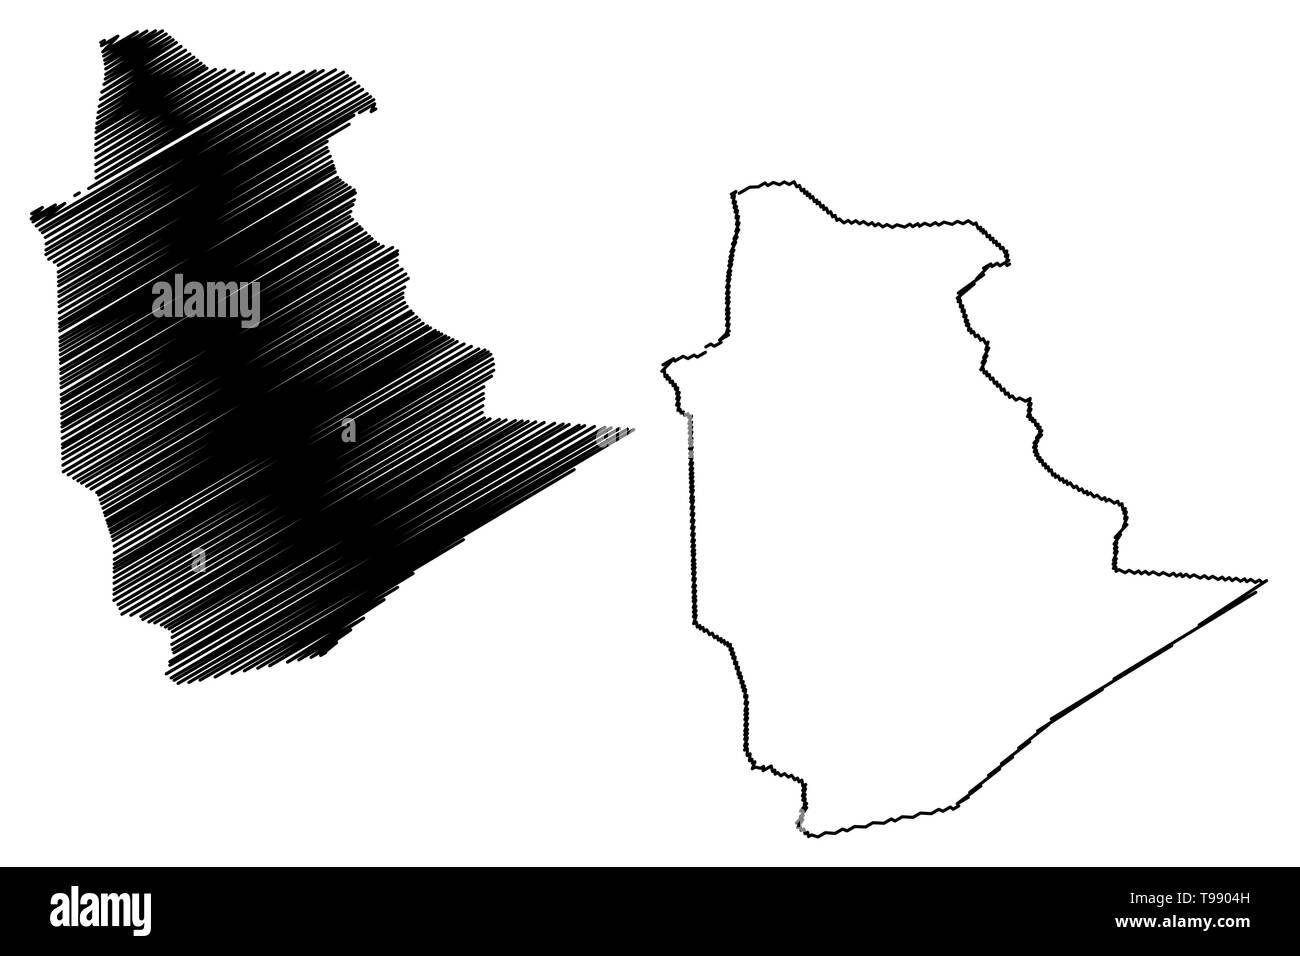 Tamanrasset Province (Provinces of Algeria, Peoples Democratic Republic of Algeria) map vector illustration, scribble sketch Tamanghasset map - Stock Image